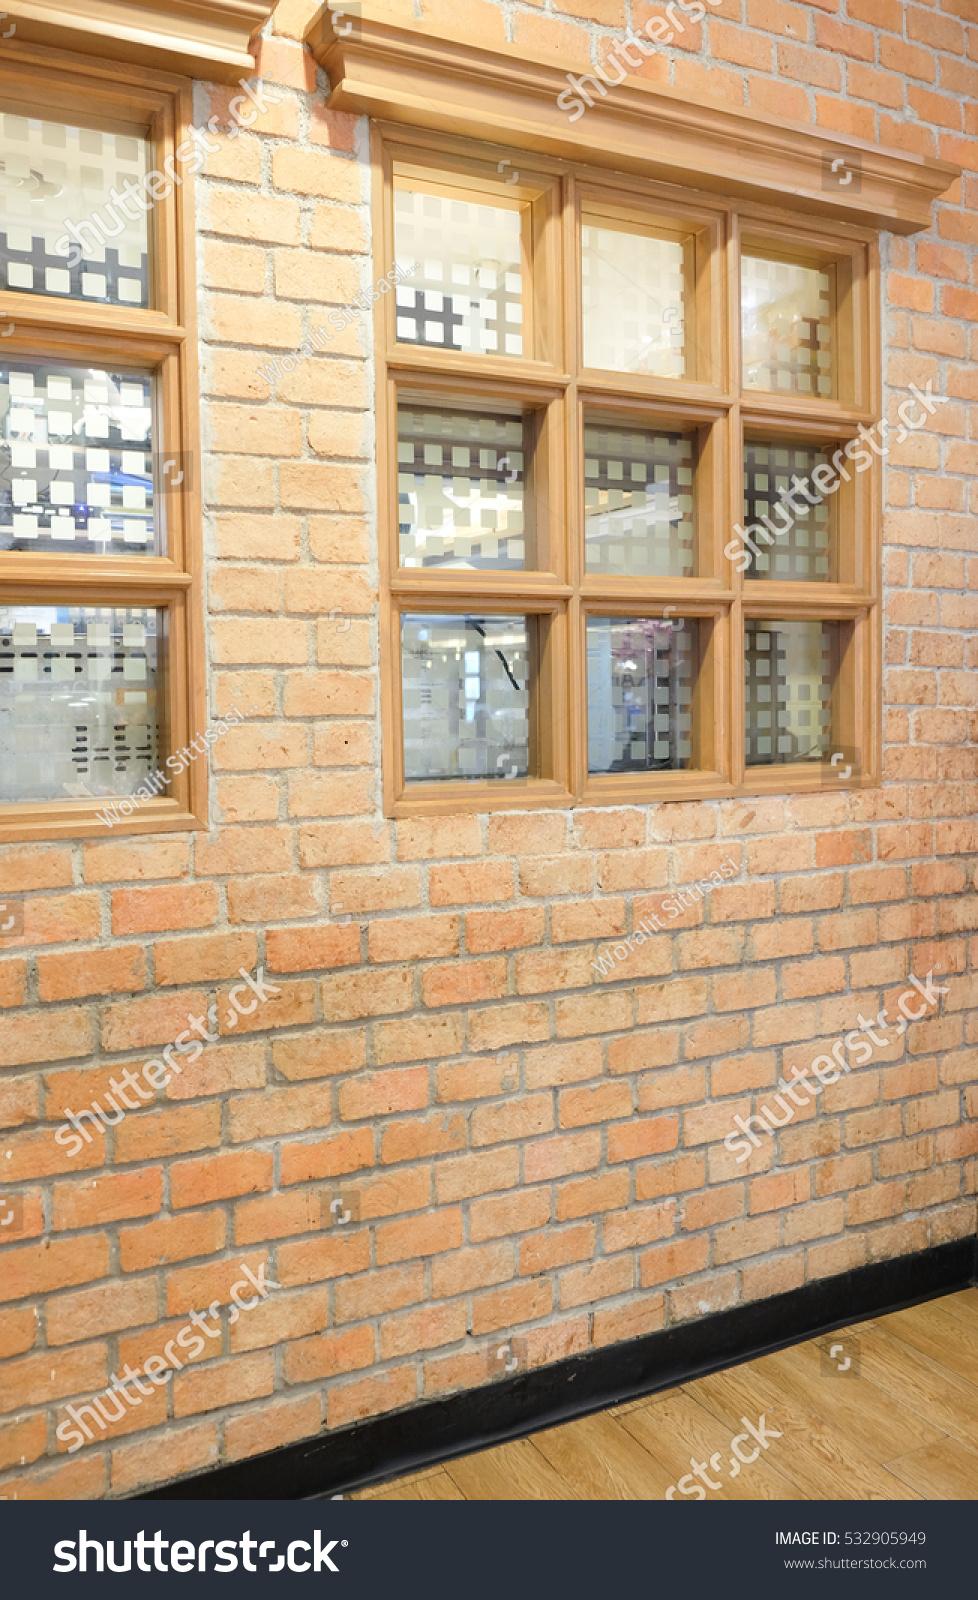 Beautiful Brick Wall Decor Illustration - Wall Art Collections ...